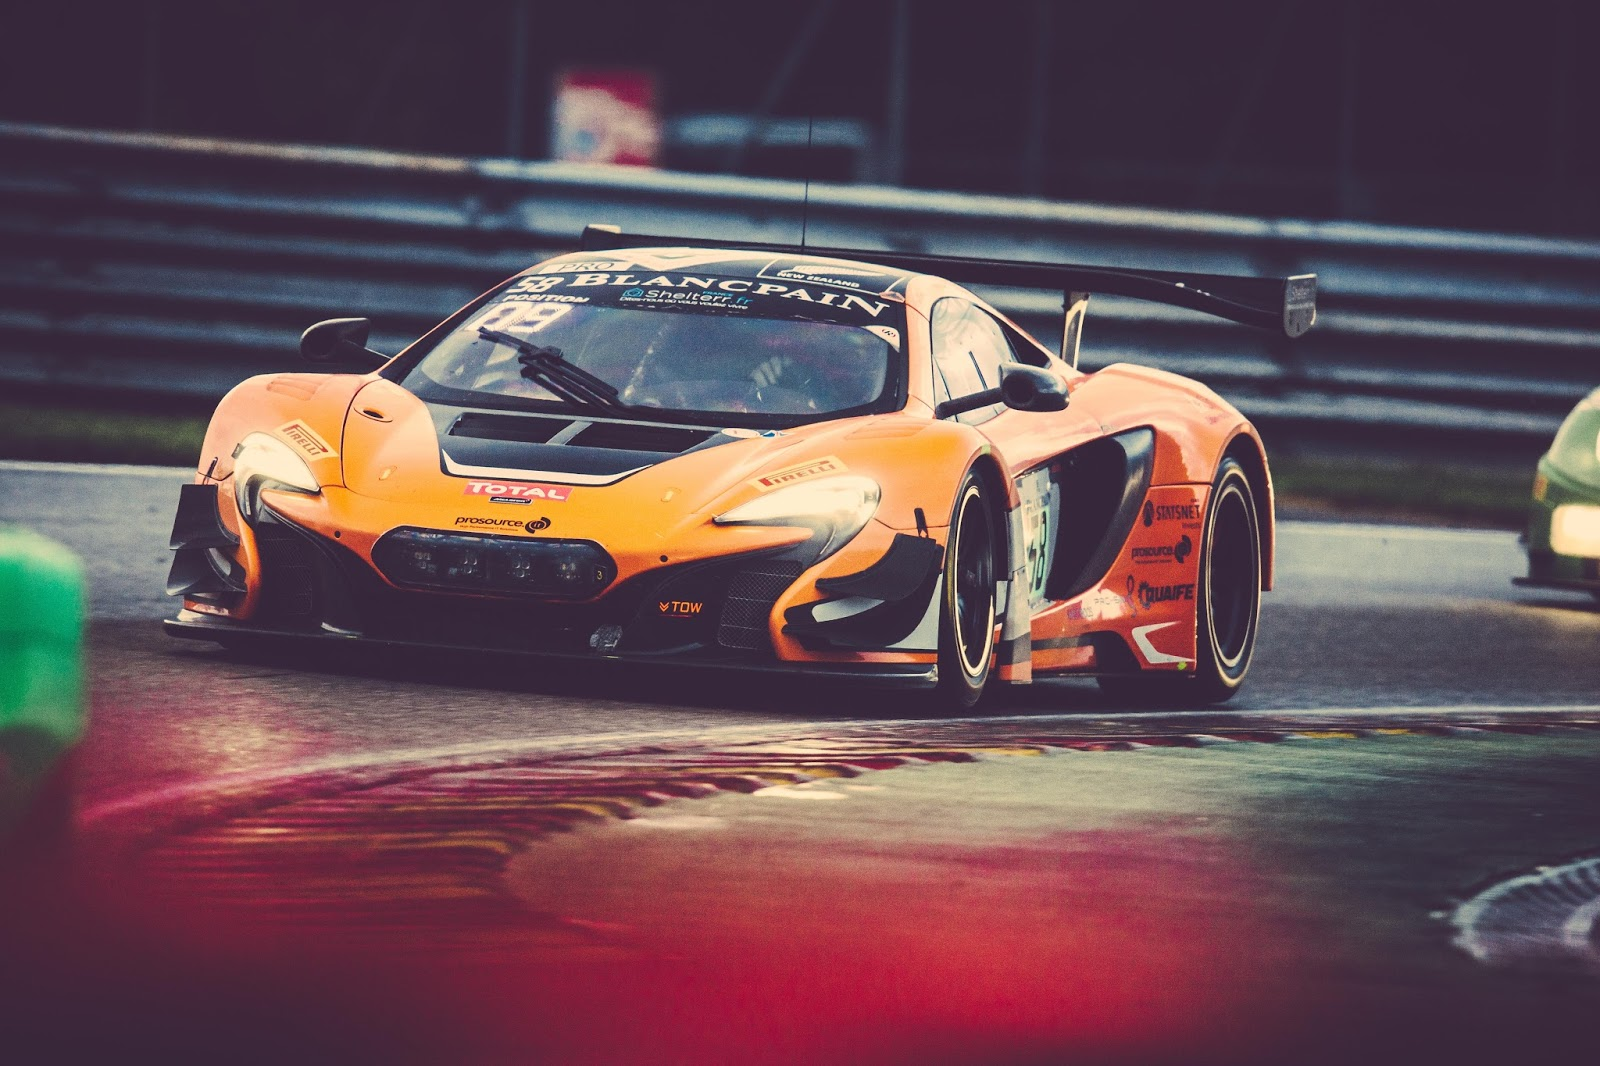 650S%2BGT3%2BSpa%2B2 Τρομακτικά γρήγορη McLaren 650S GT3 σπάει το ρεκόρ πίστας, διανύοντας 6 χιλιόμετρα σε 2 λεπτά!